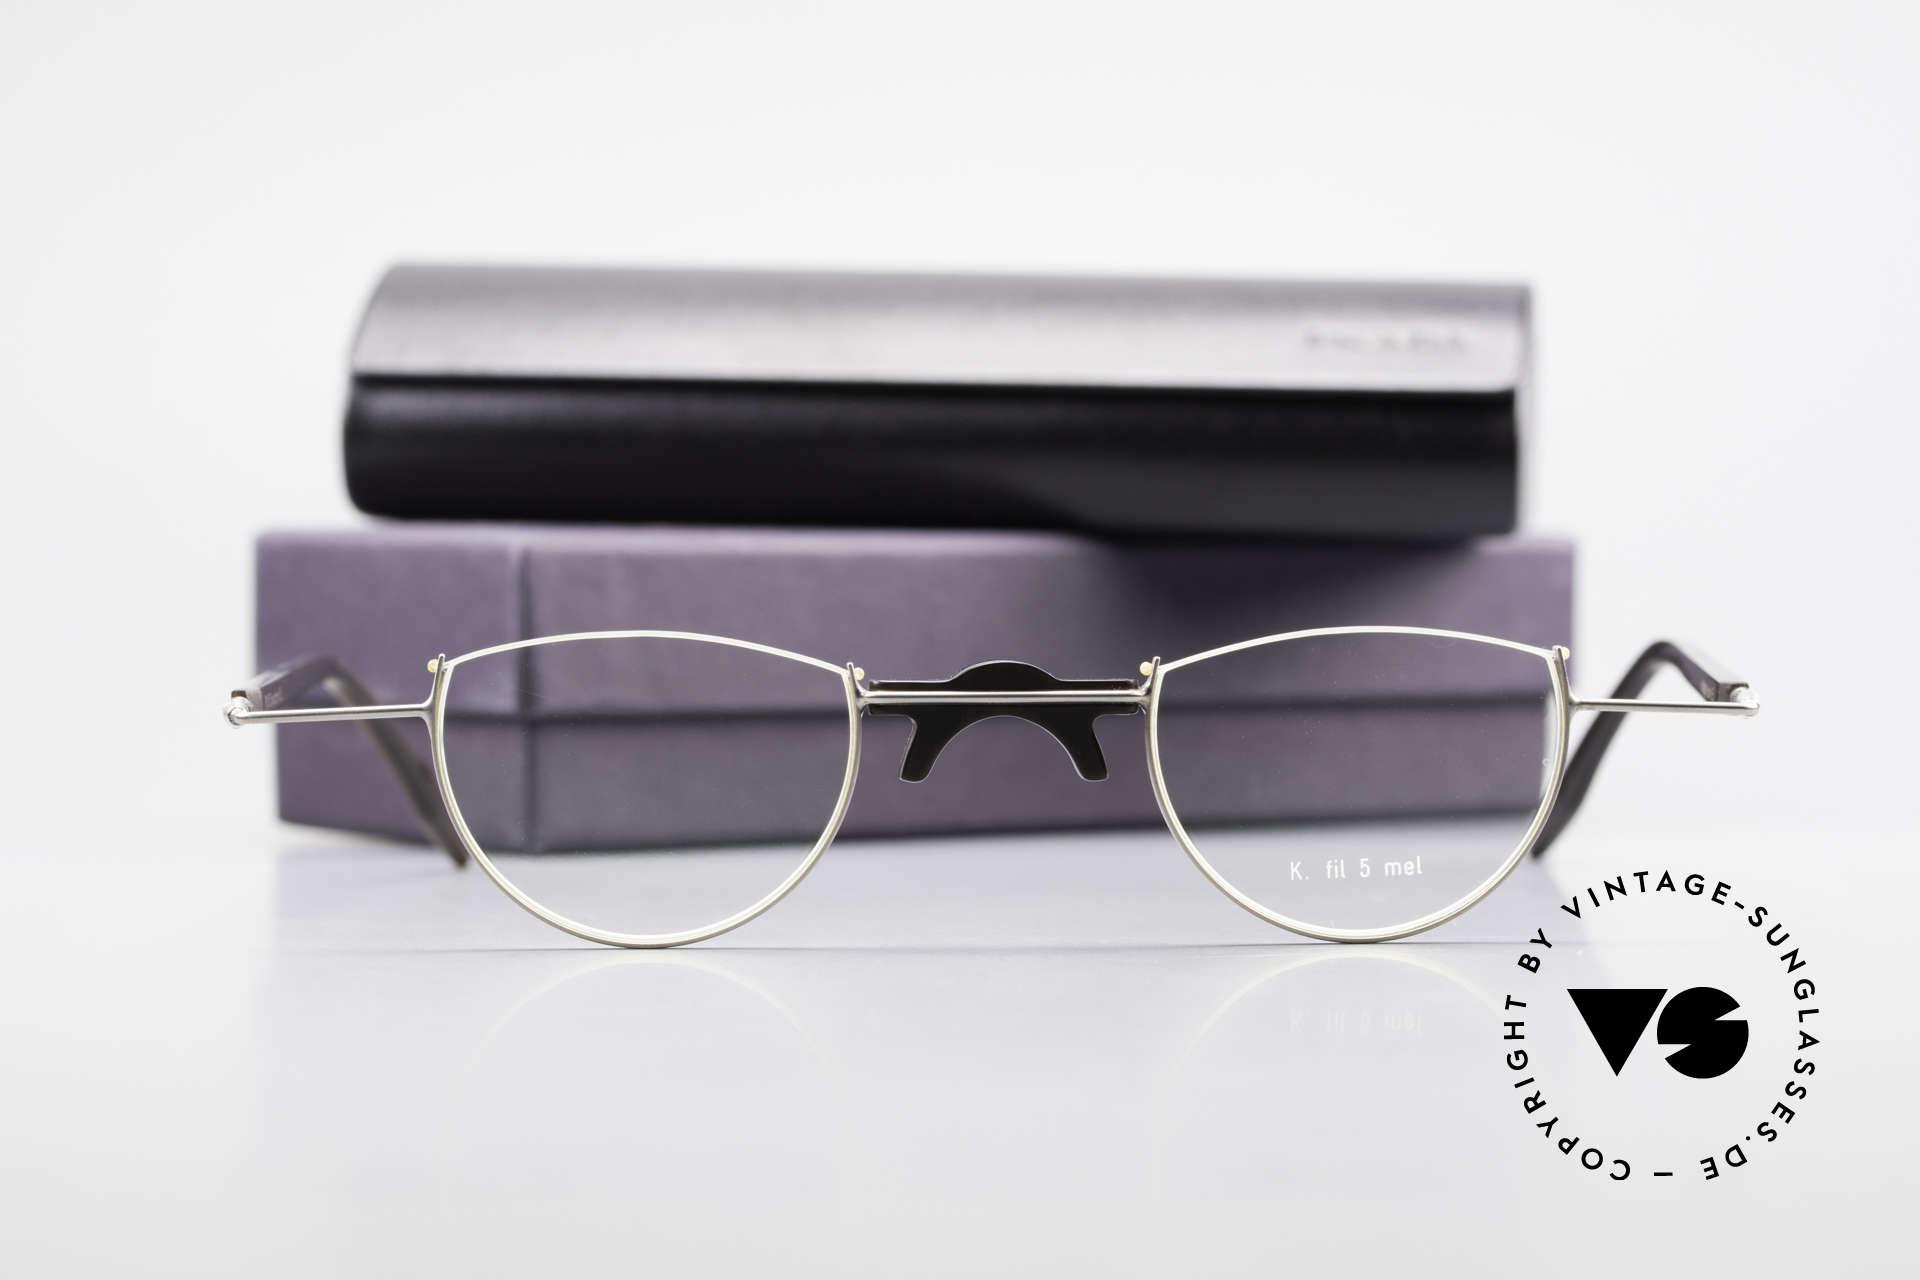 Wolfgang Katzer Fil 5 Genuine Horn Reading Glasses, Size: large, Made for Men